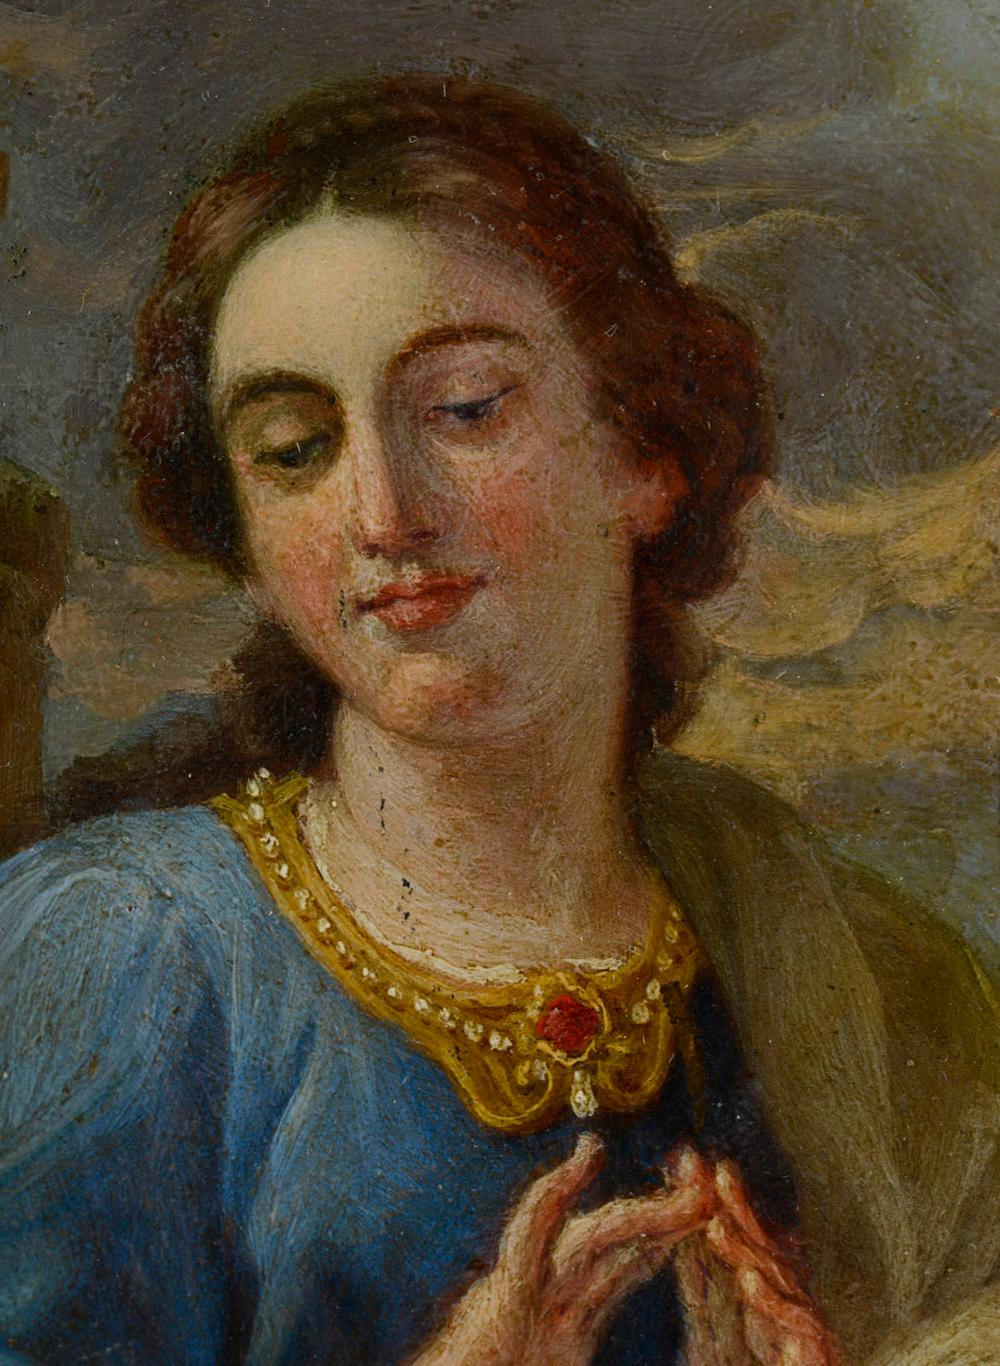 Stª Bárbara, séc. XVIII, Óleo s/cobre, 14,7x11,9cm